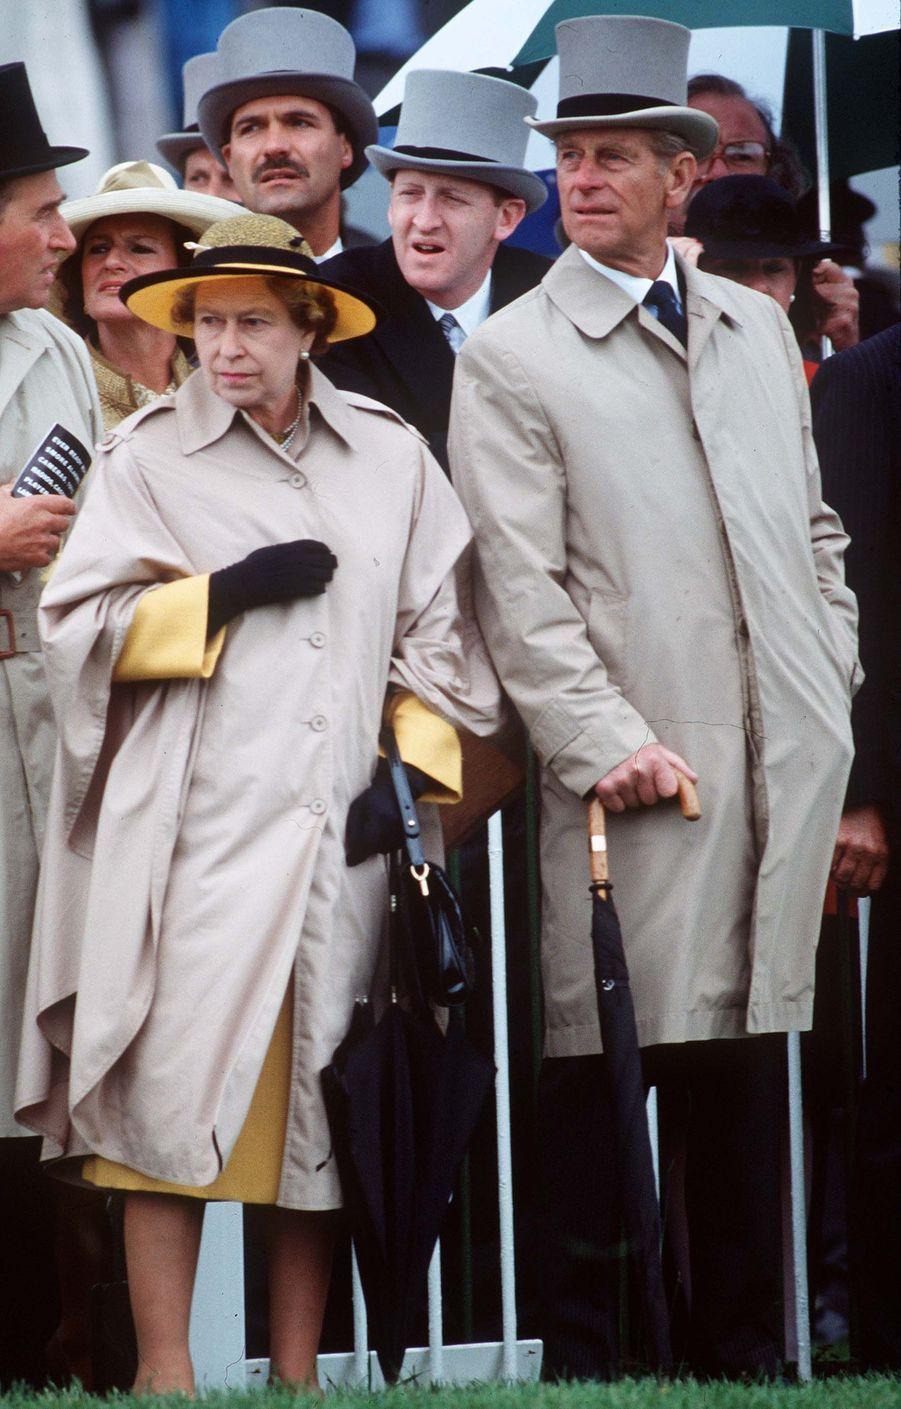 La reine Elizabeth II avec le prince Philip à Epsom (juin 1990)